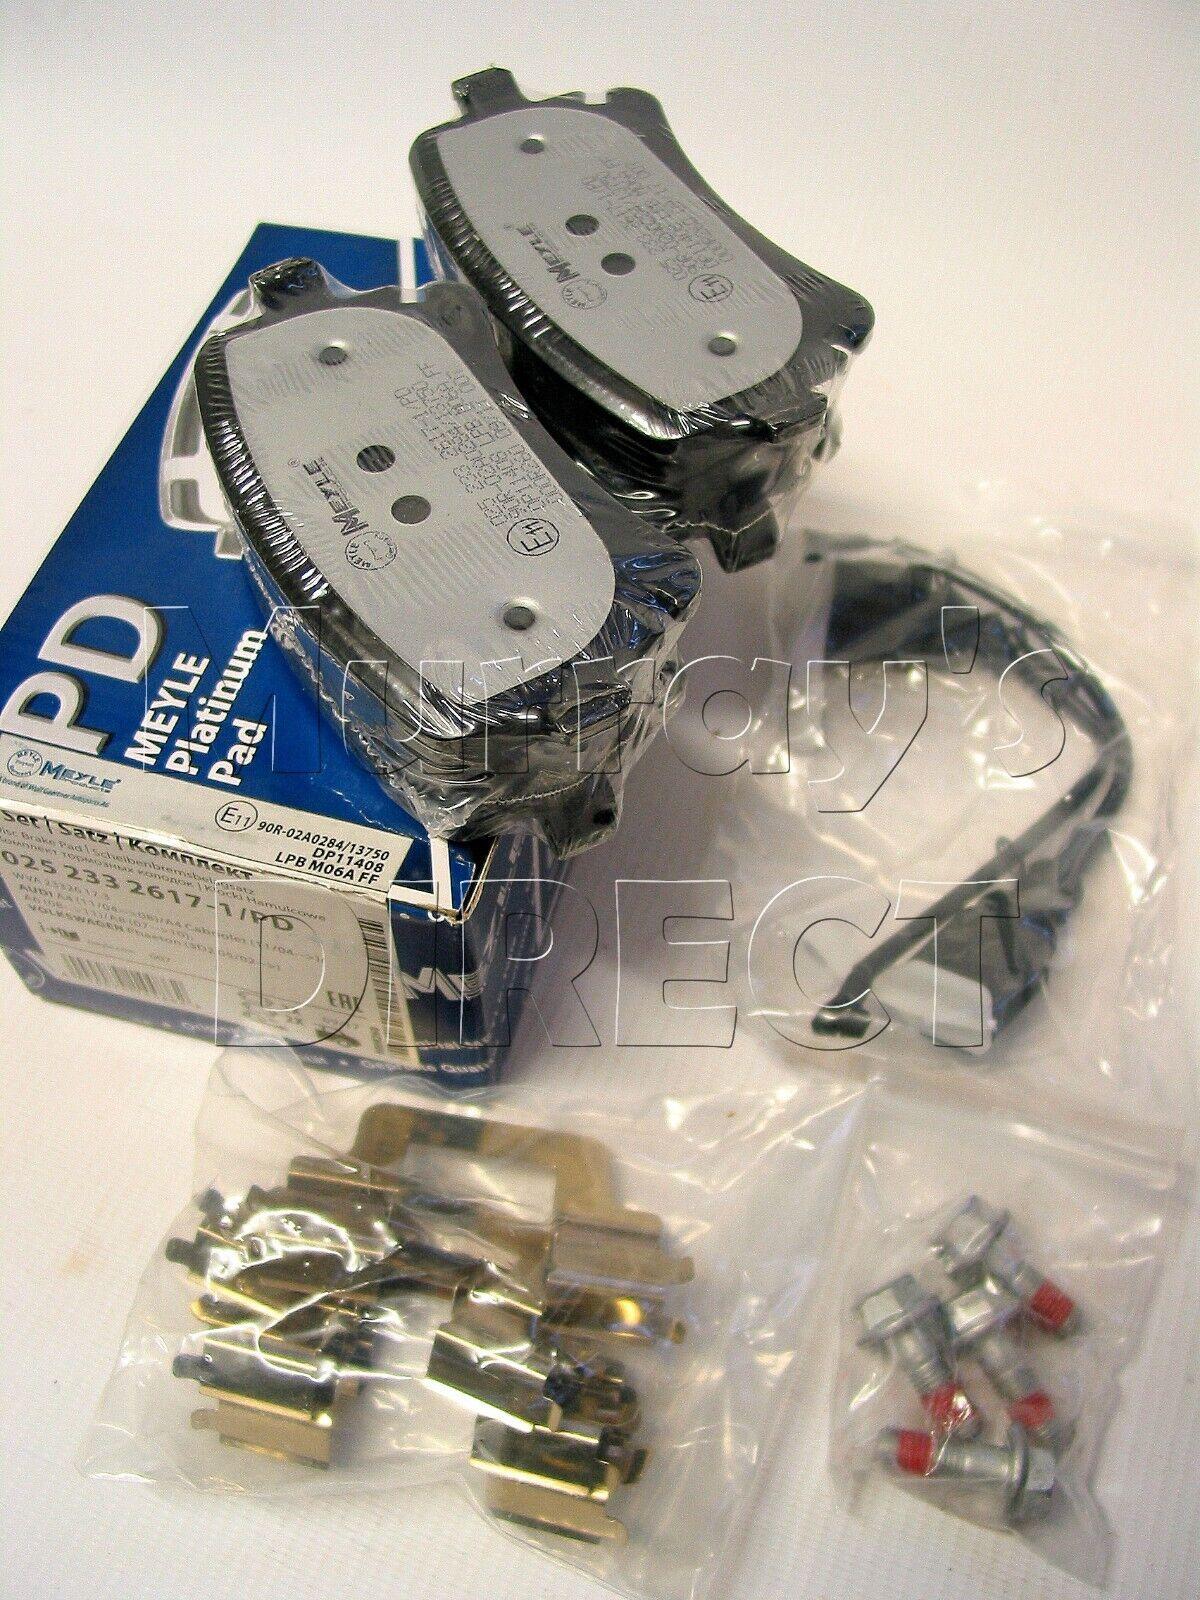 Car Parts Meyle Platinum Rear Brake Pads Vw T5 T6 Transporter Camper Van Caravelle 294mm Vehicle Parts Accessories Visitestartit Com